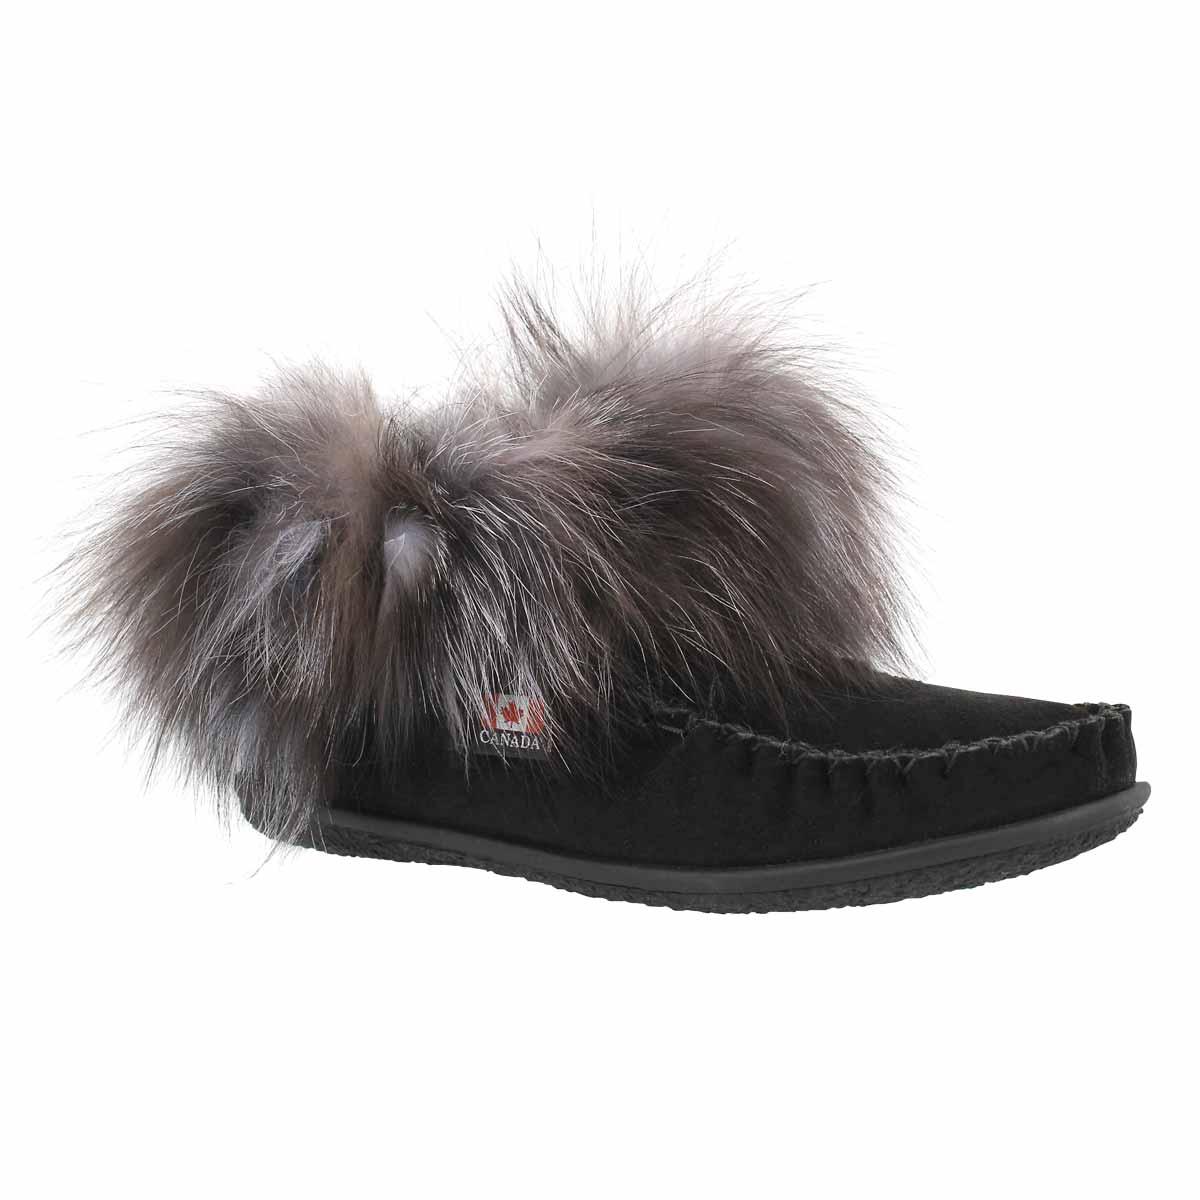 Women's FRANCES black fox fur moccasin